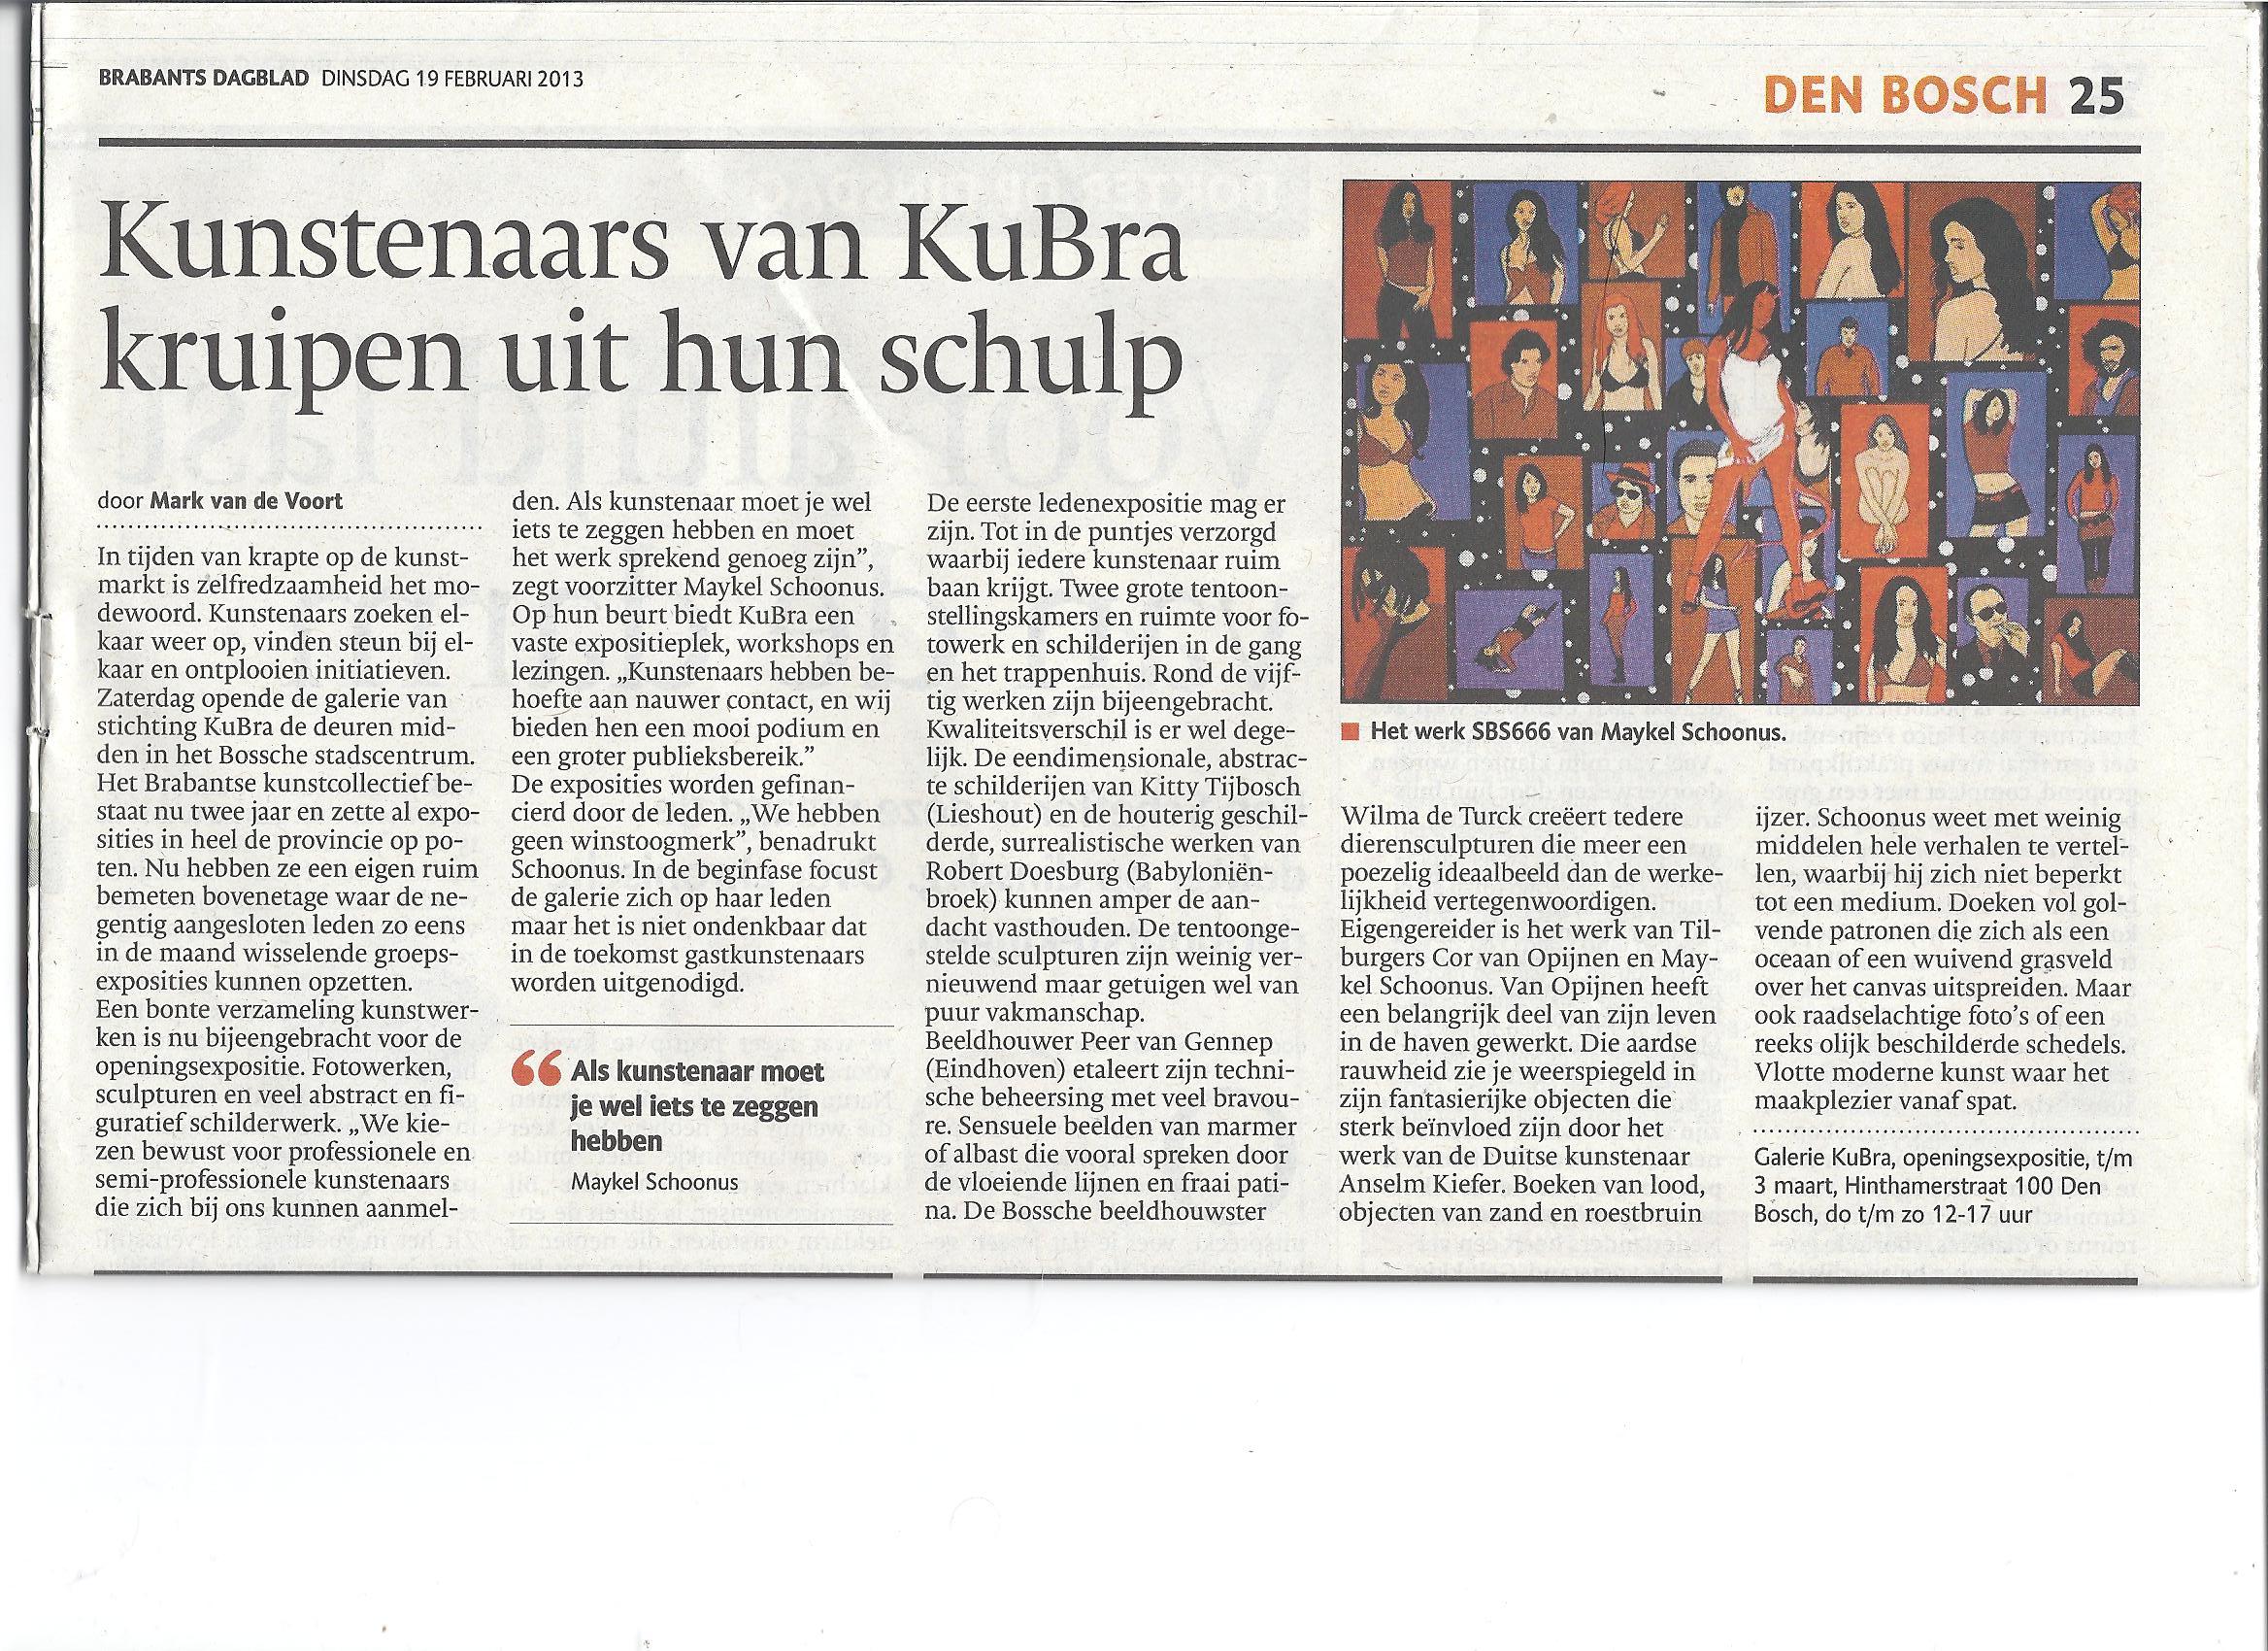 19 febuari 2013 Brabants Dagblad